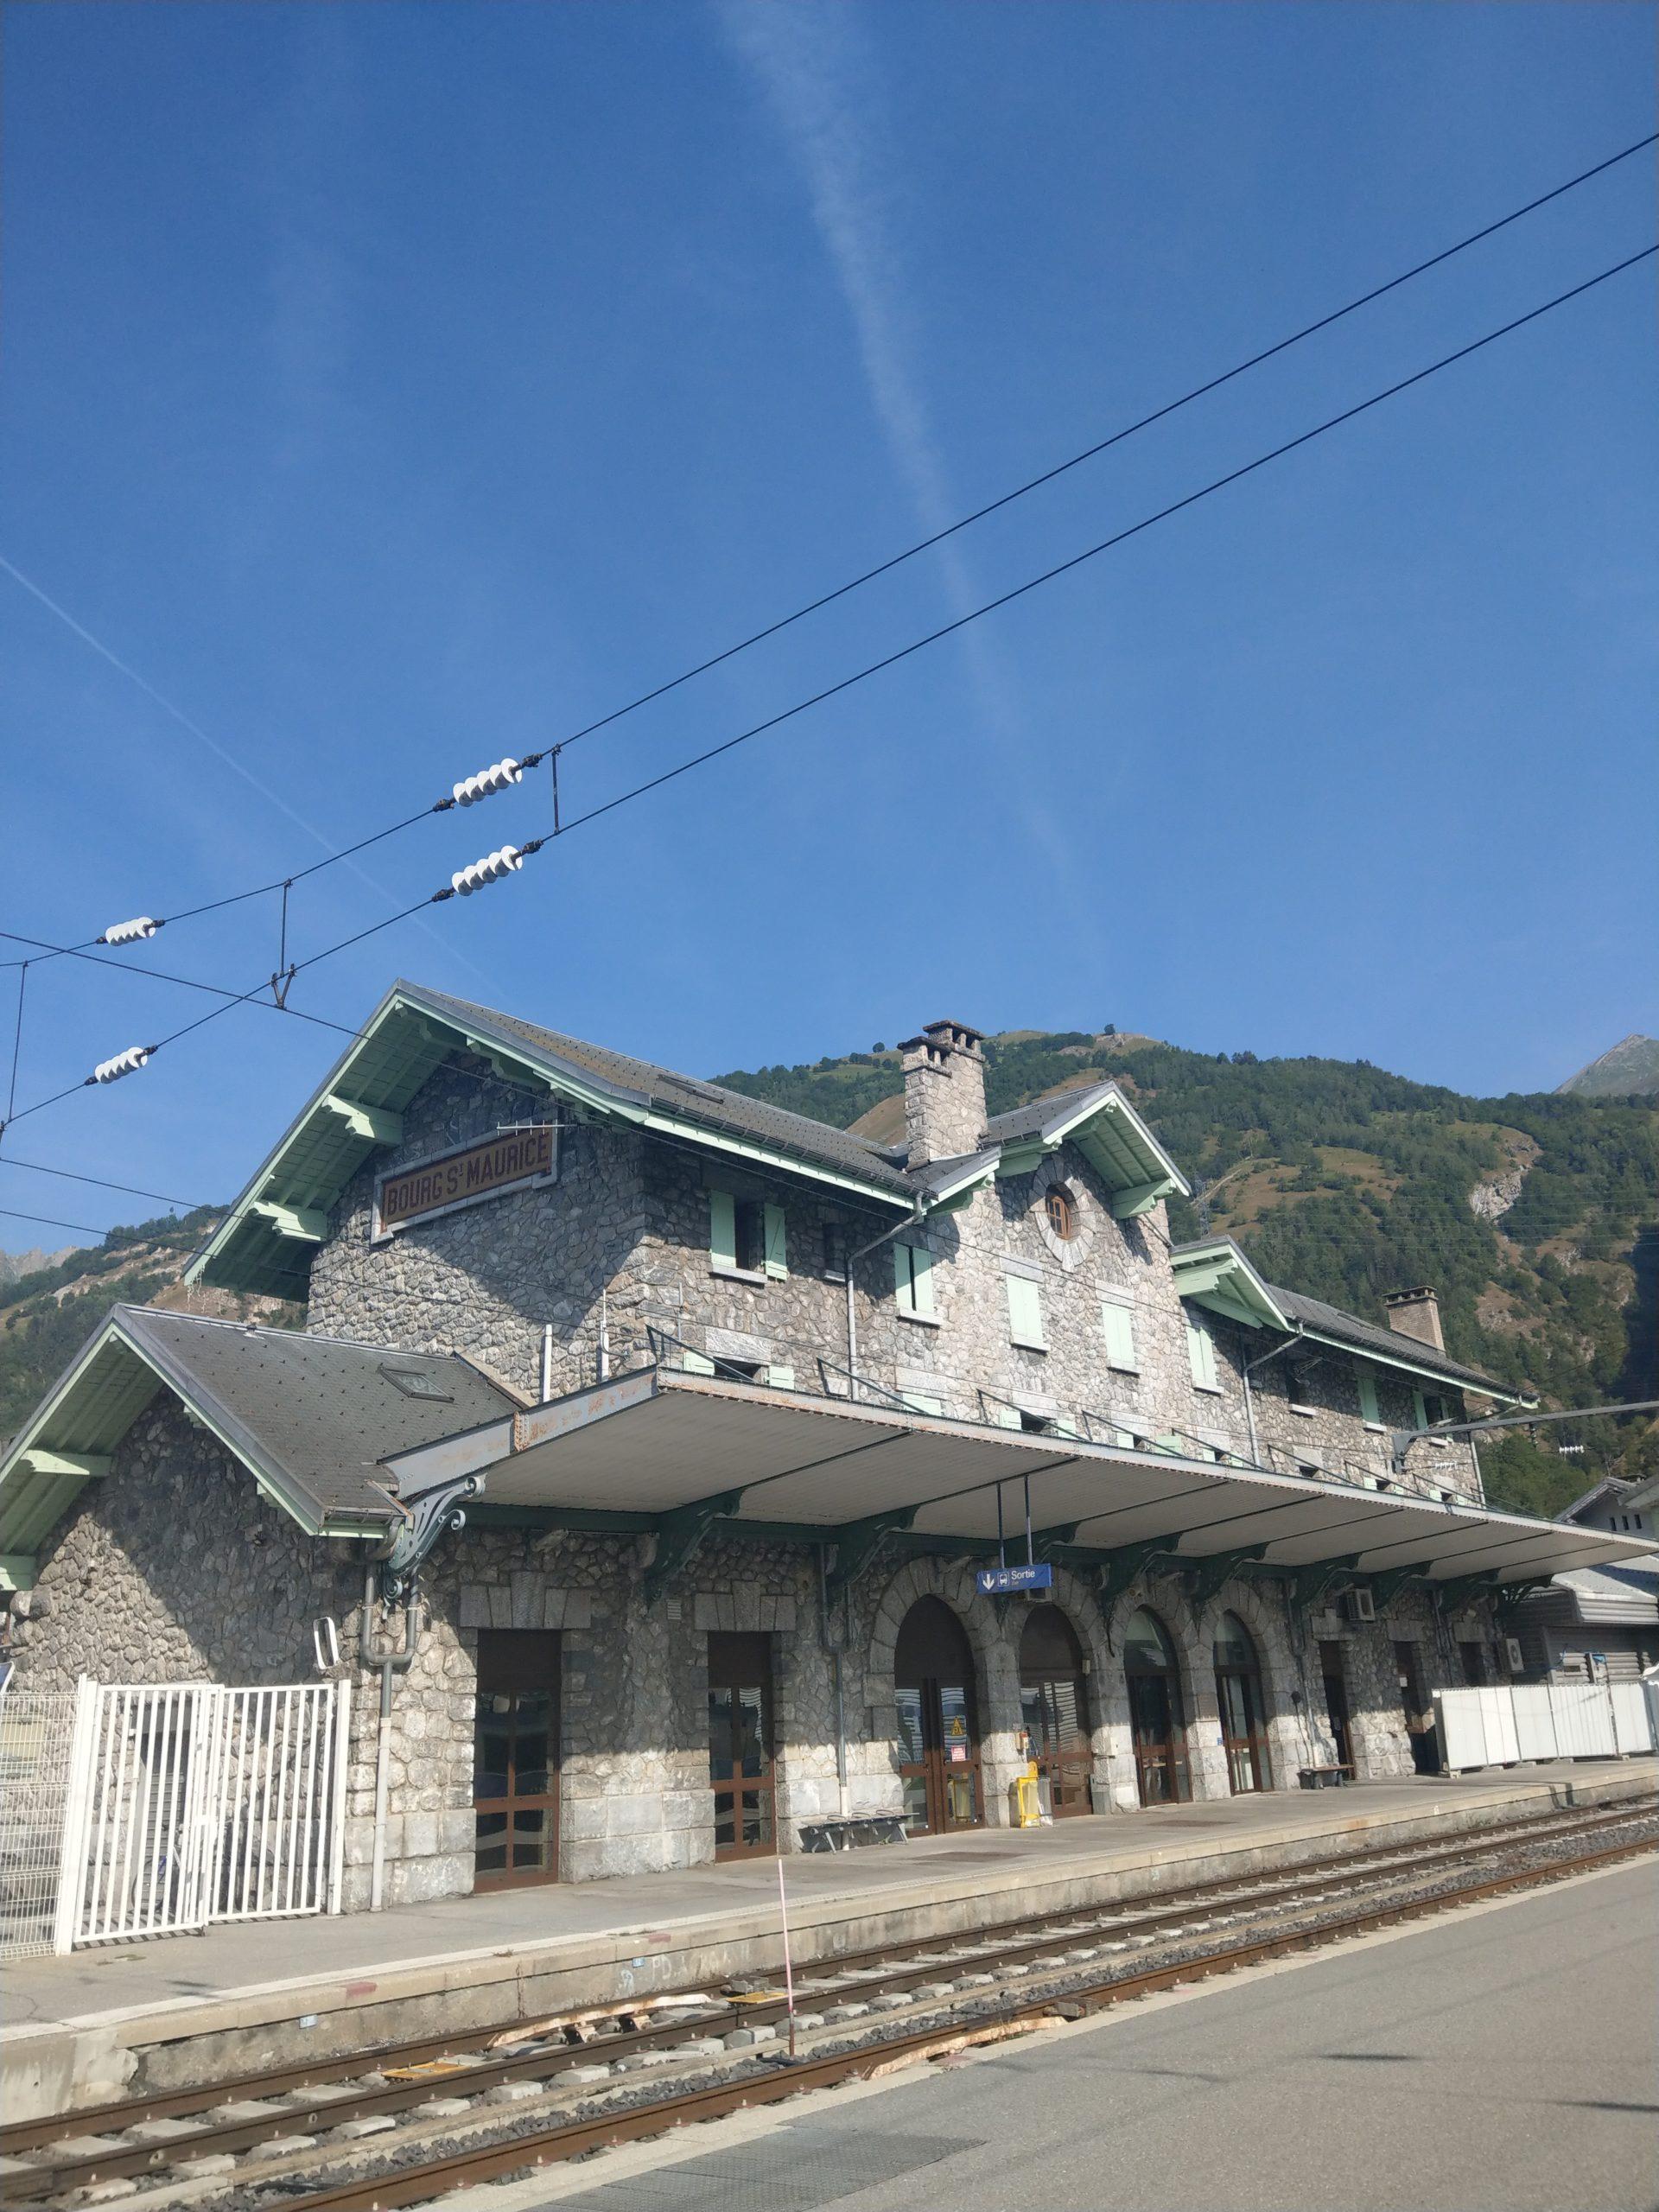 Gare de Bourg Saint-Maurice